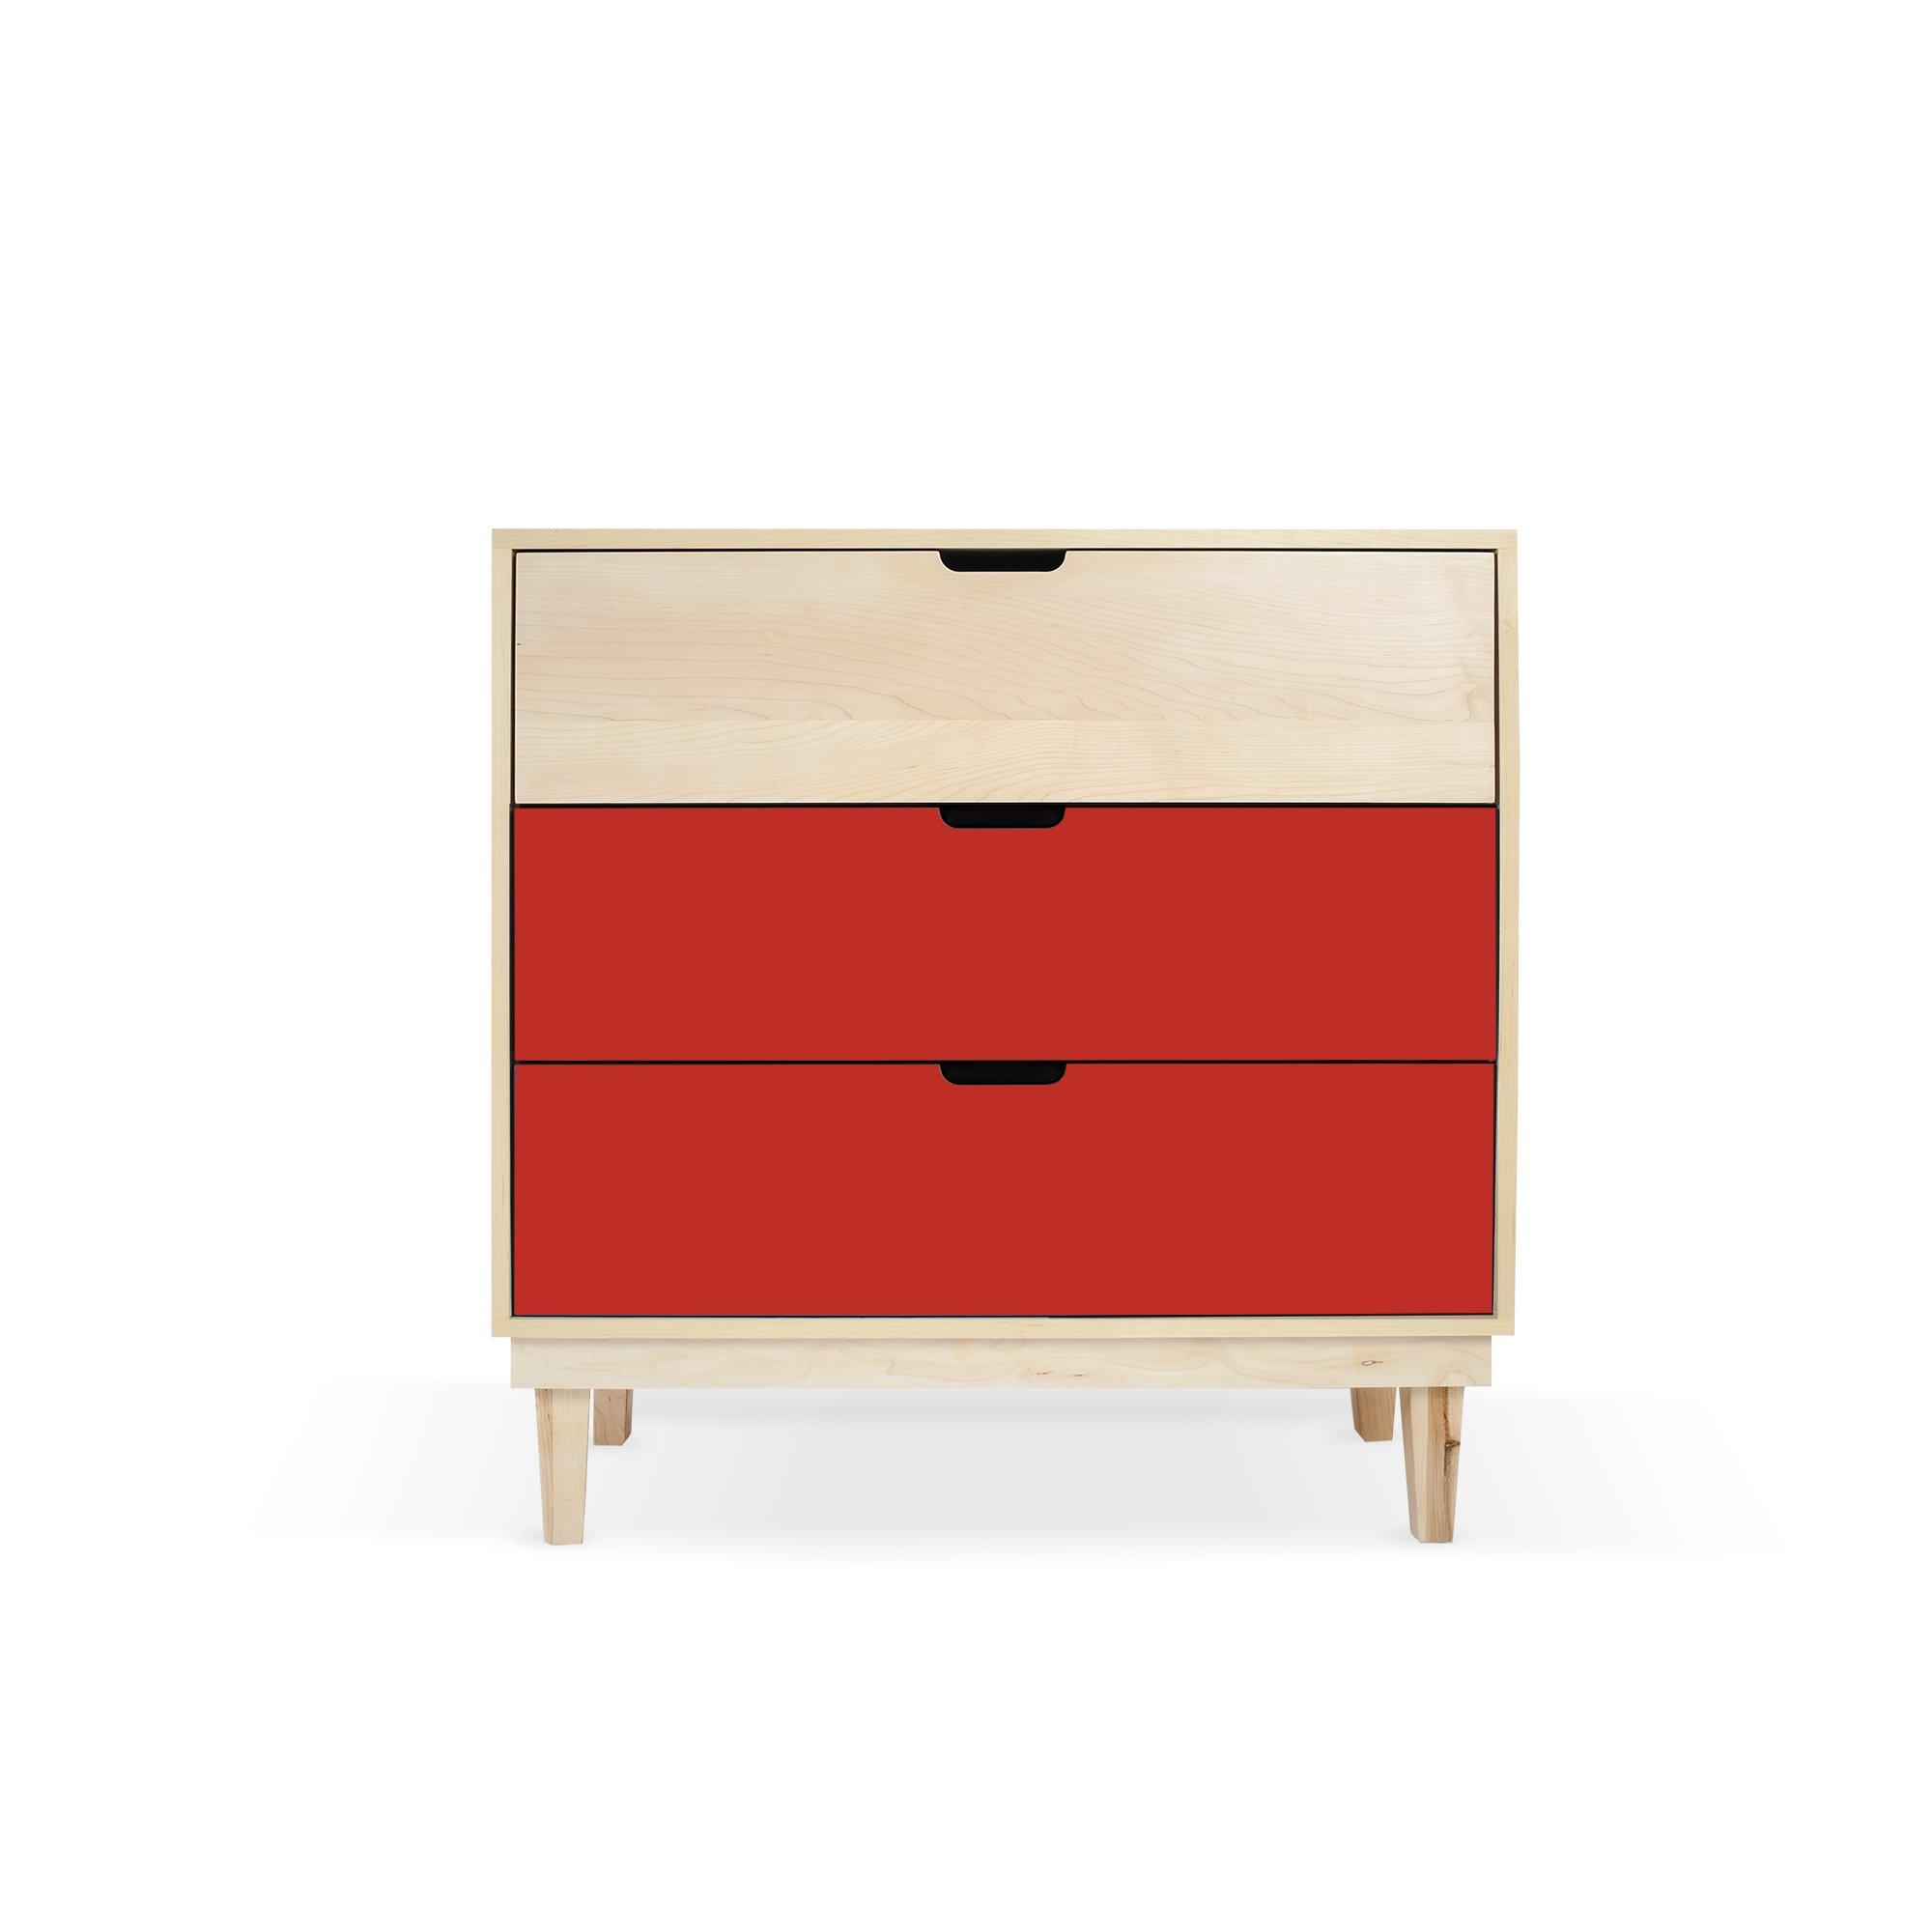 Roxy 6 Drawer Dresser Shabby Chic Dresser Shabby Chic Furniture